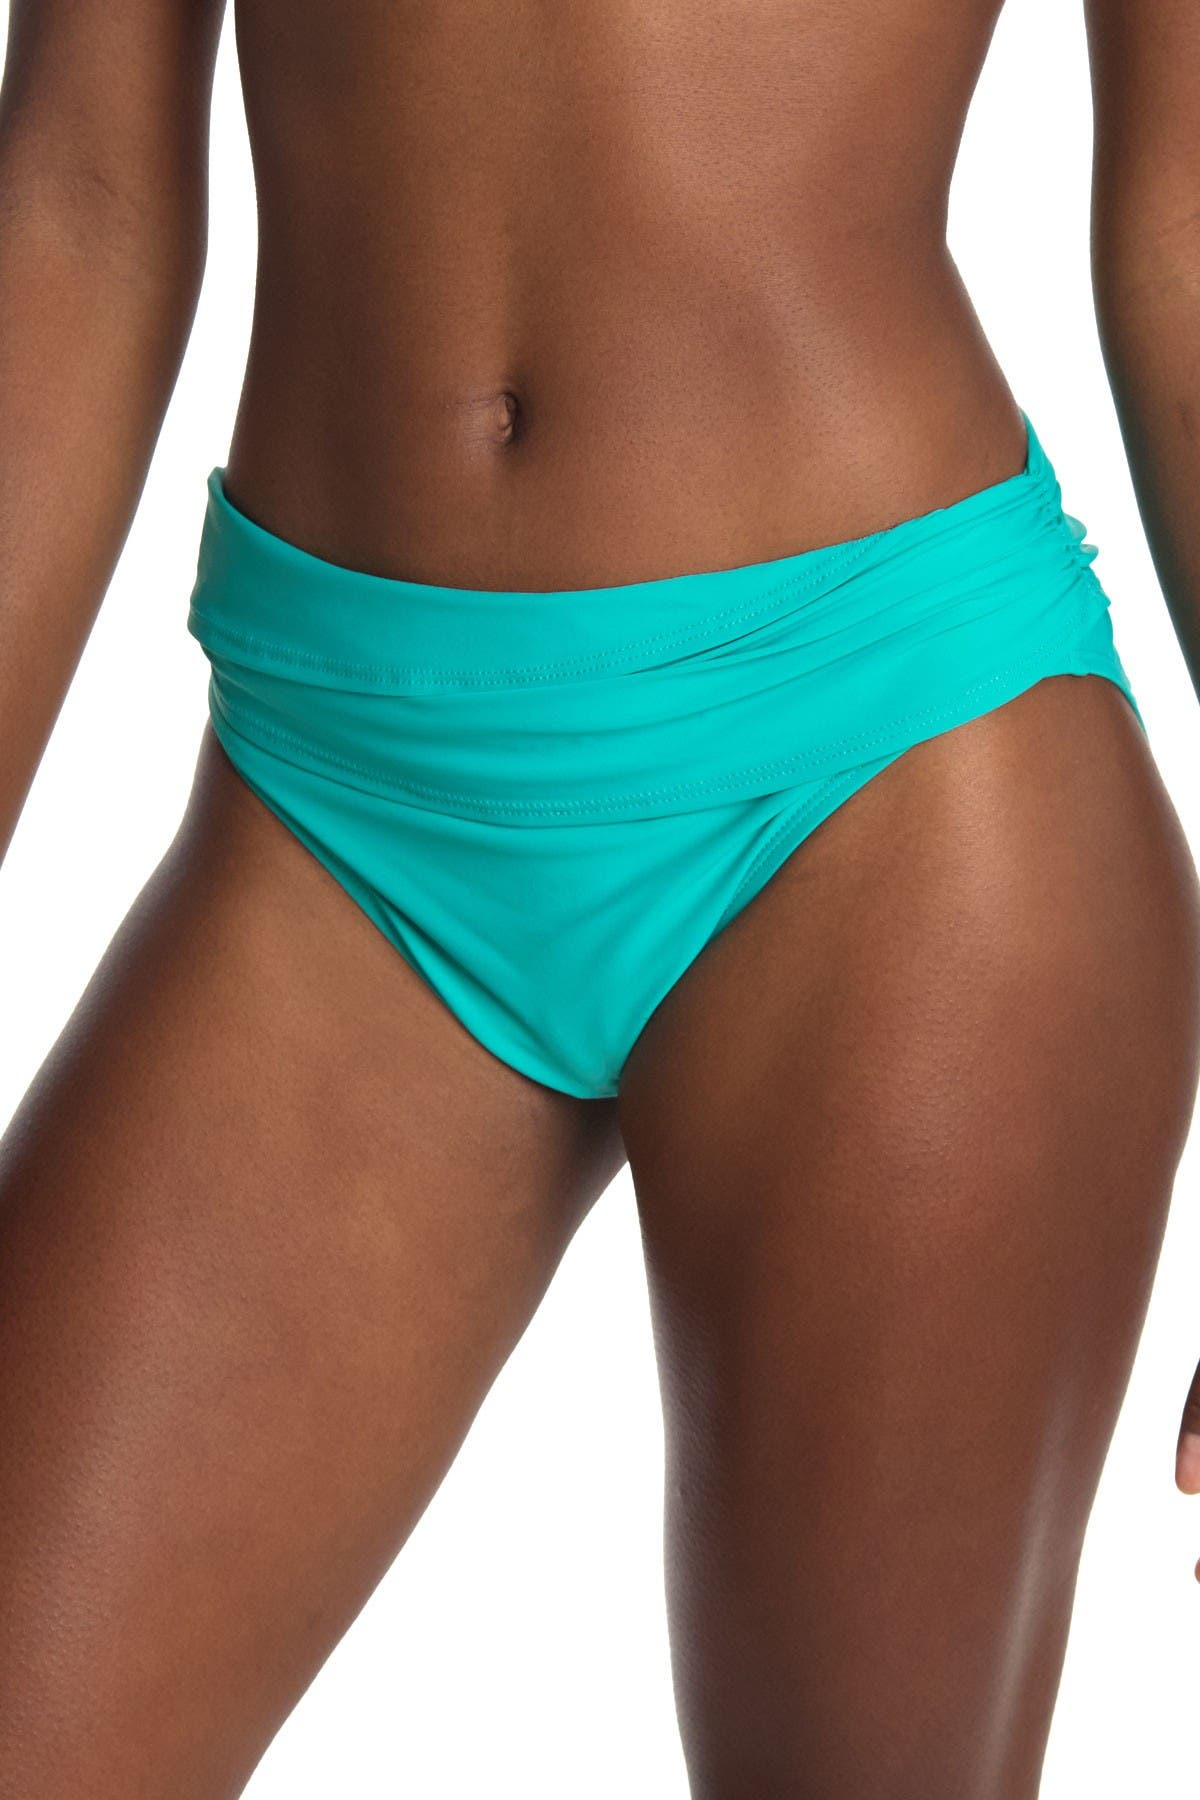 Image of Athena Solid Retro Swim Pants